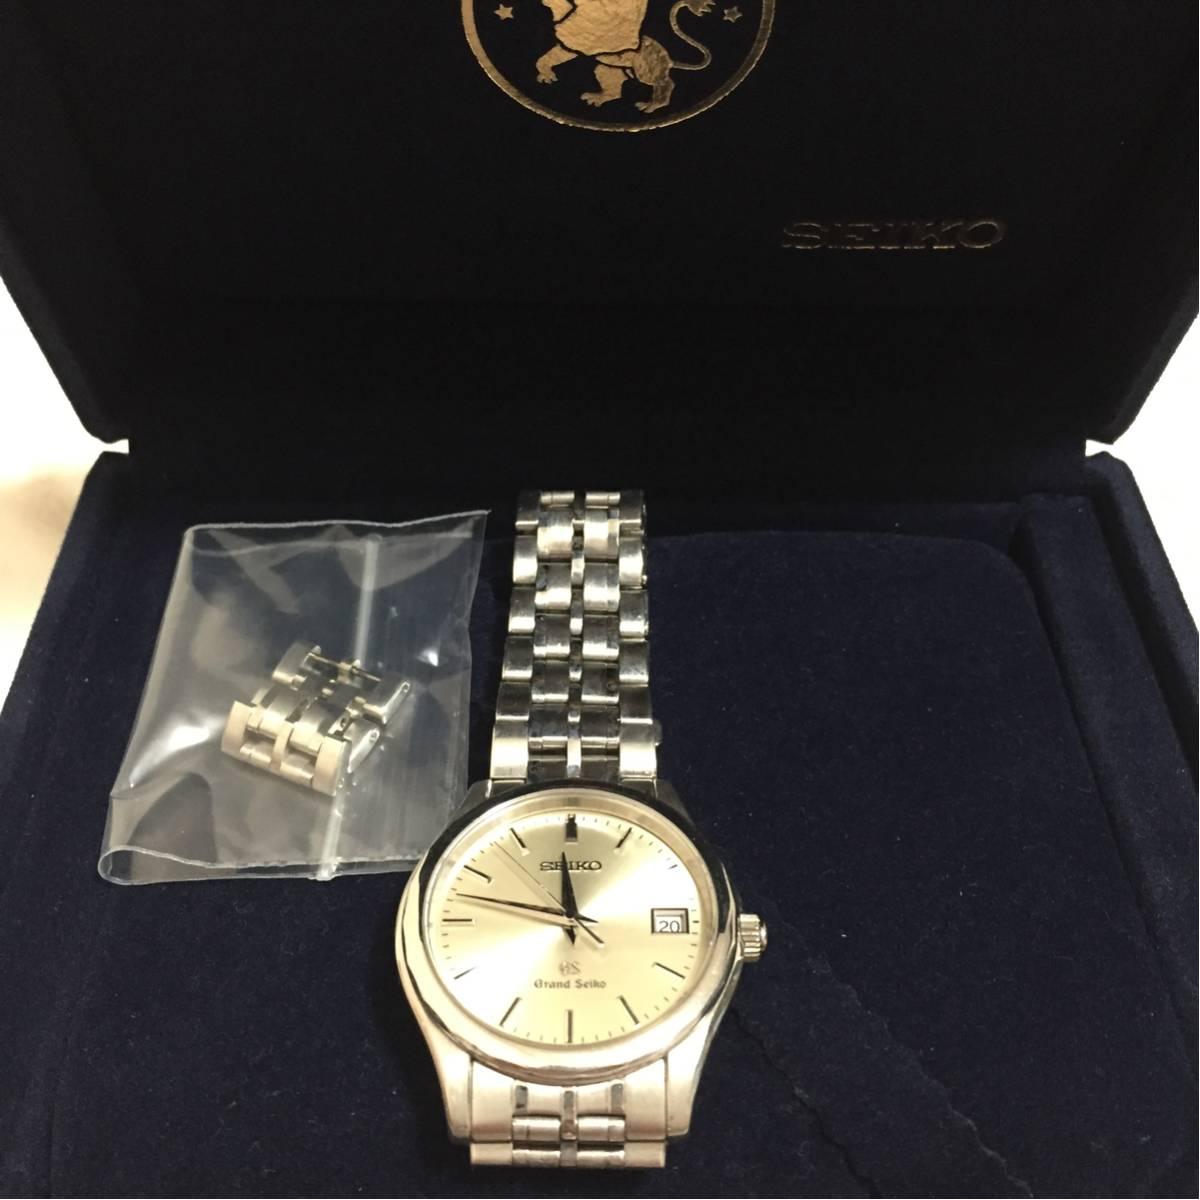 Grand Seiko グランドセイコー 18Kホワイトゴールド SBGX019 グランドセイコー最高峰モデル 正規品 WG無垢腕時計